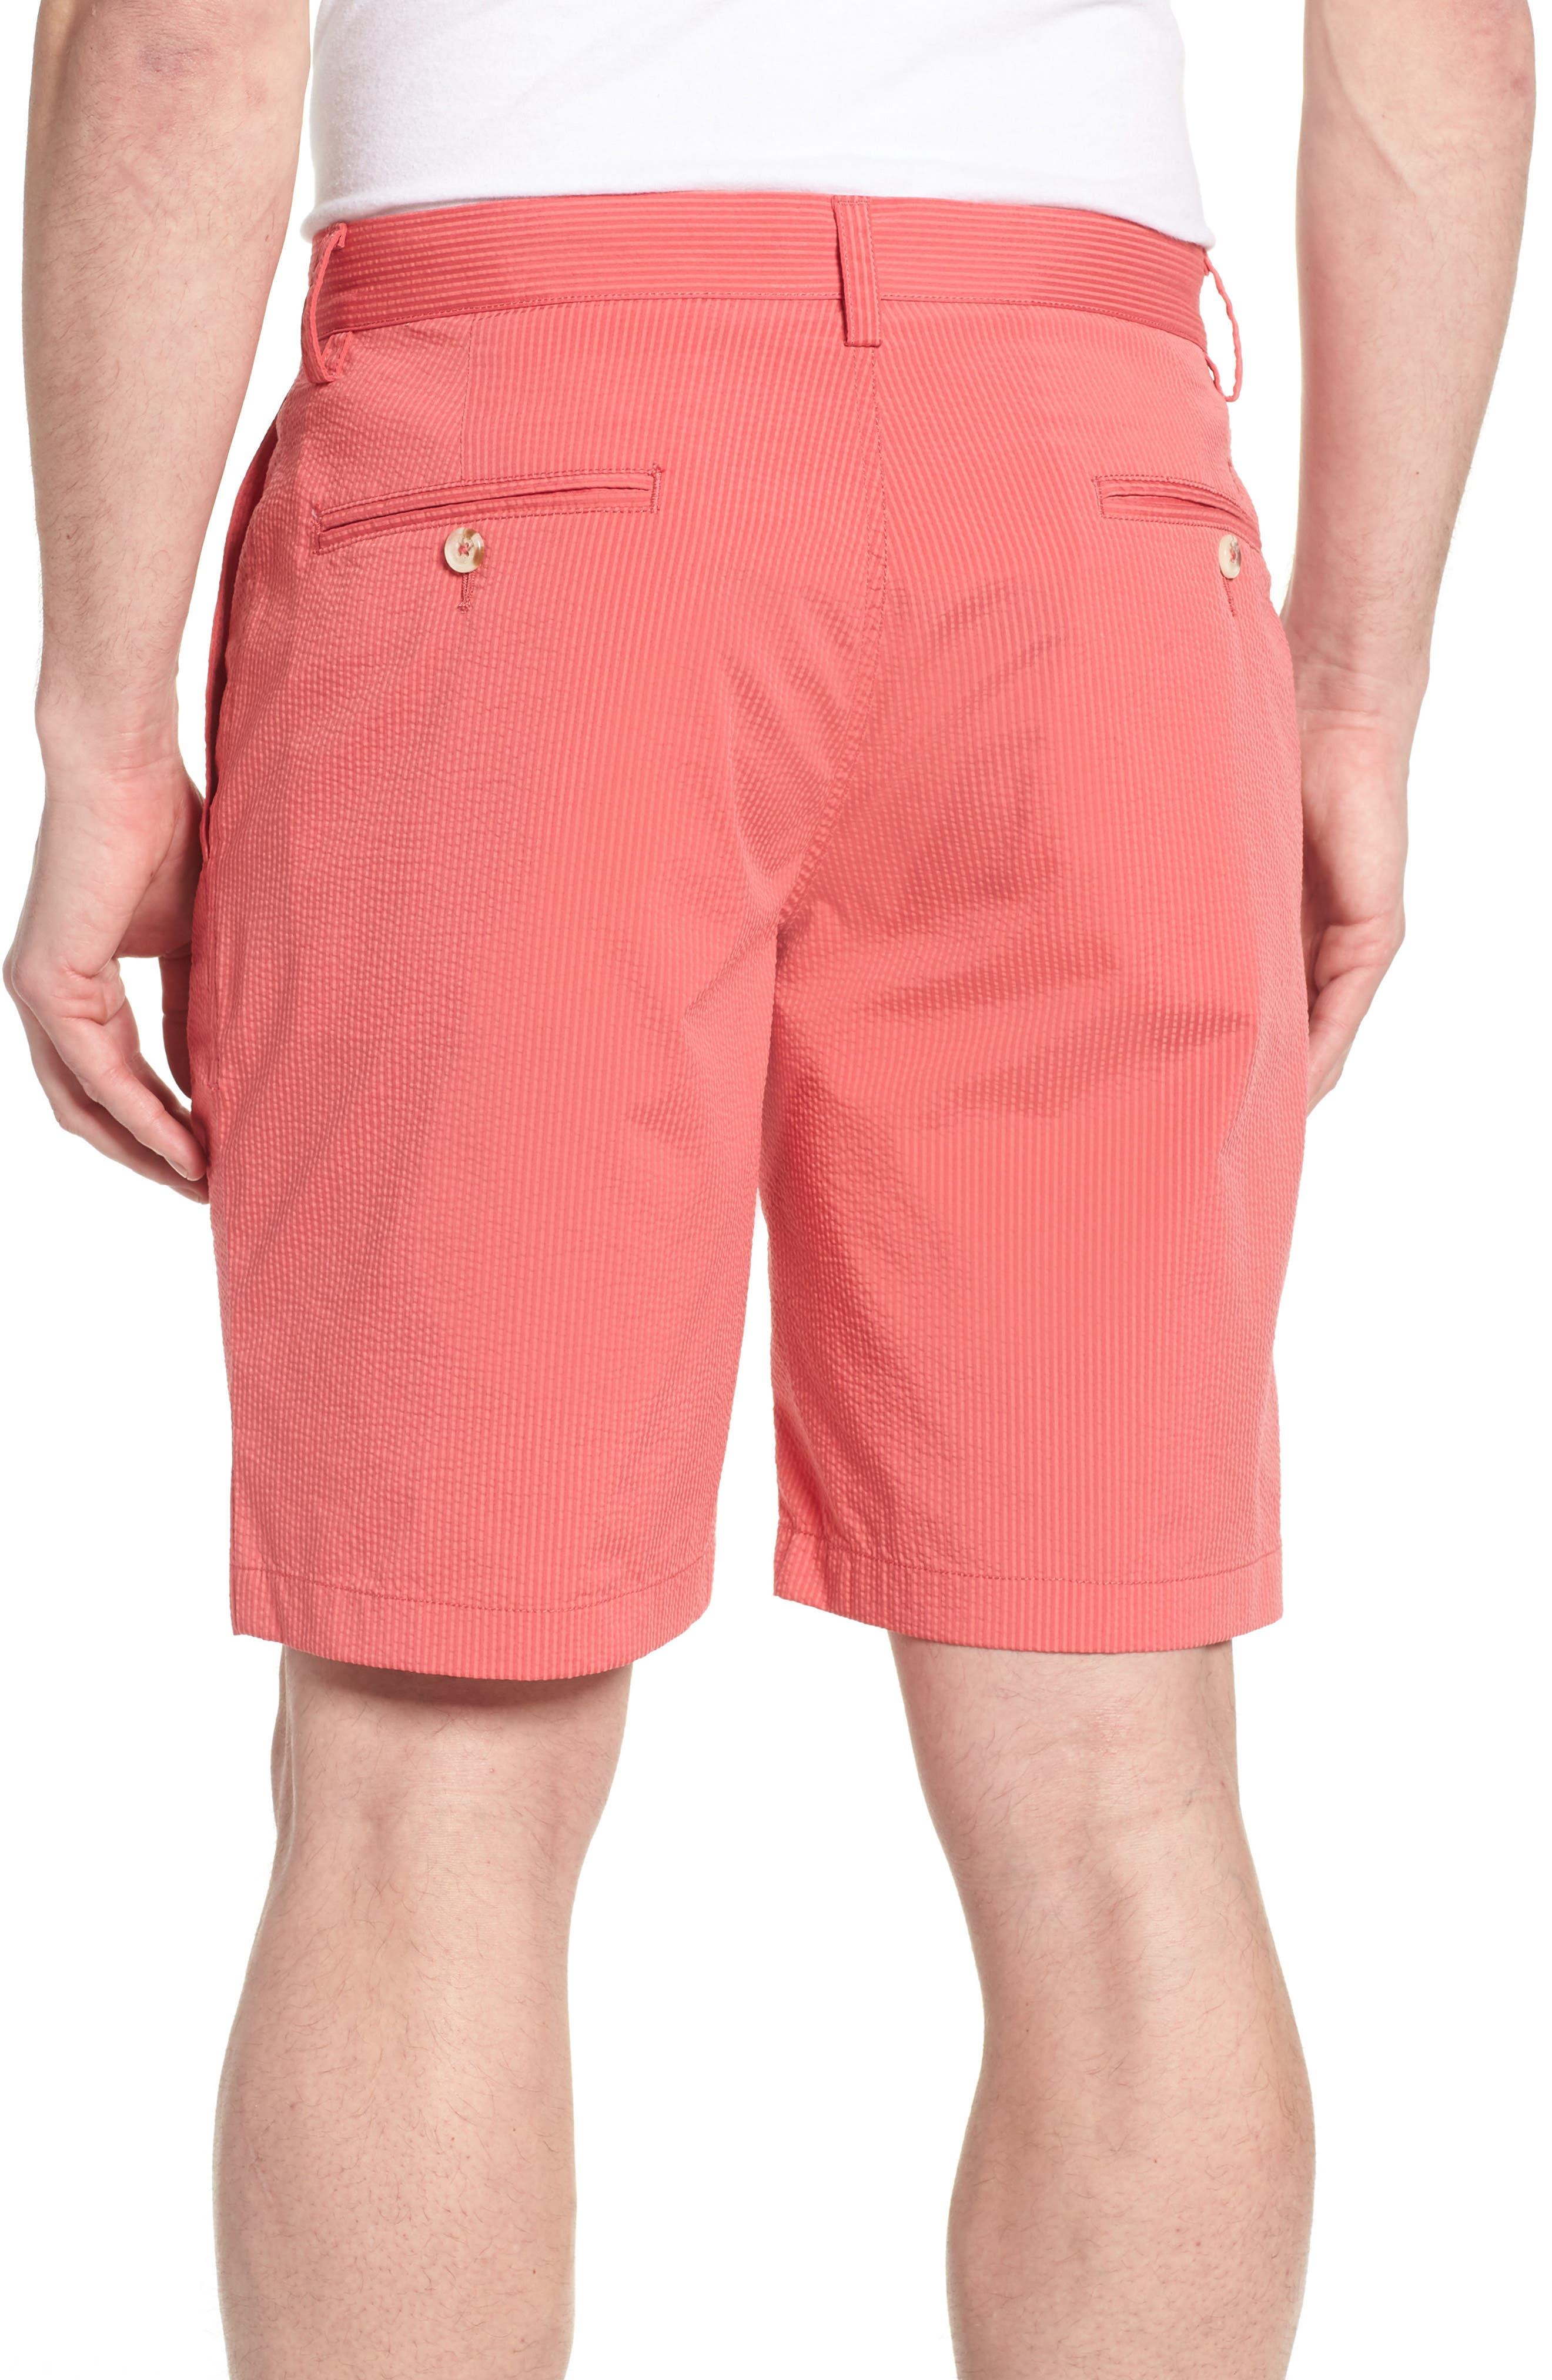 Seersucker Shorts,                             Alternate thumbnail 2, color,                             Charleston Red